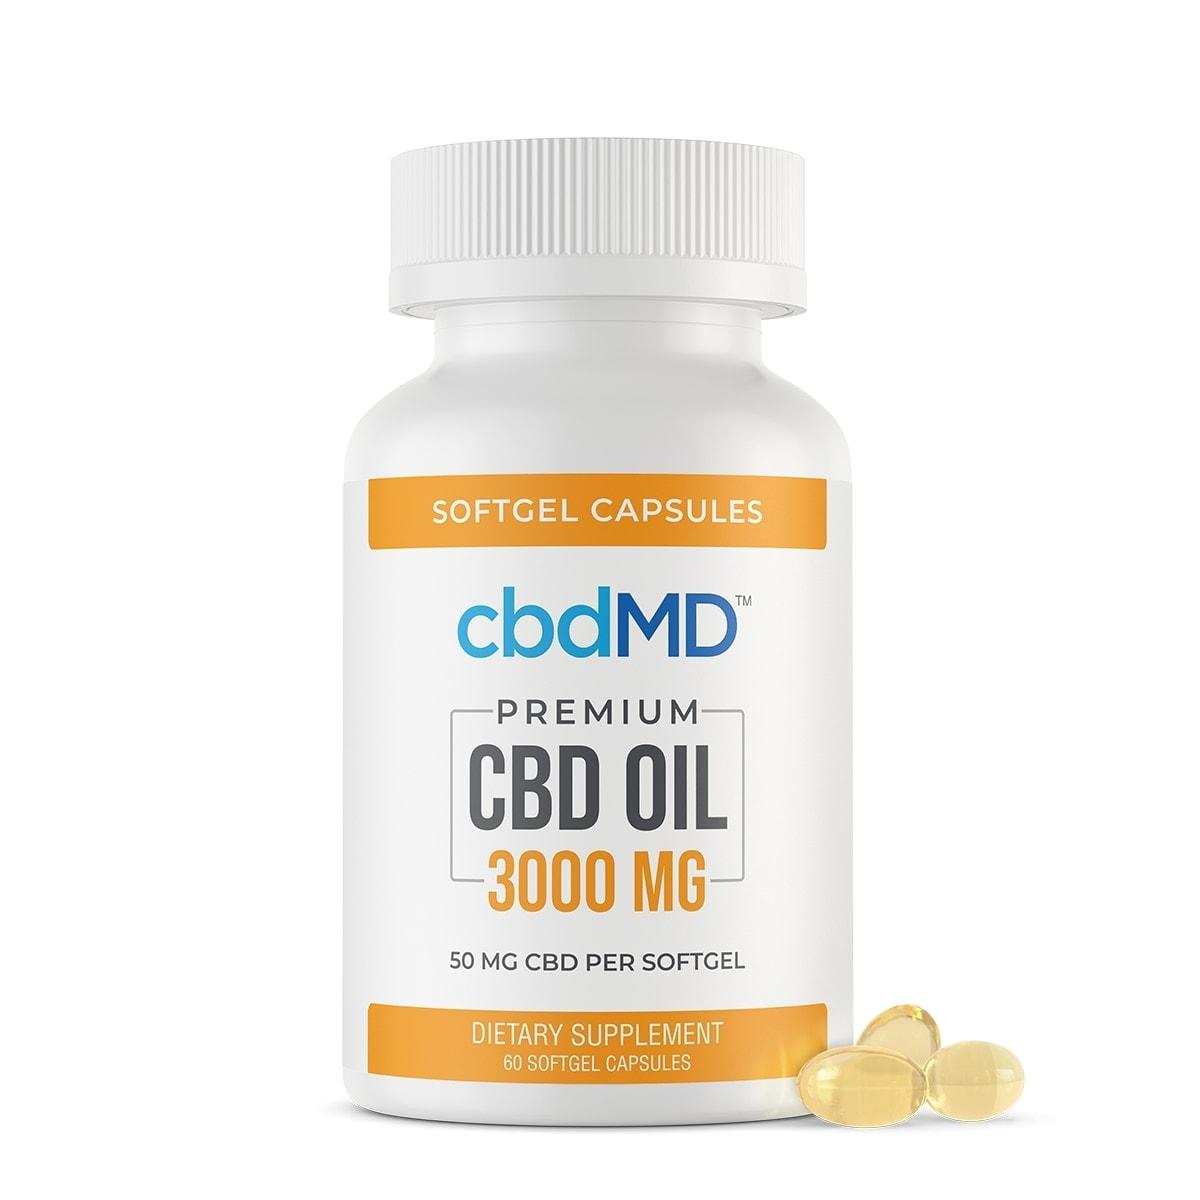 cbdMD, CBD Oil Softgel Capsules, Broad Spectrum THC-Free, 60-Count, 3000mg of CBD